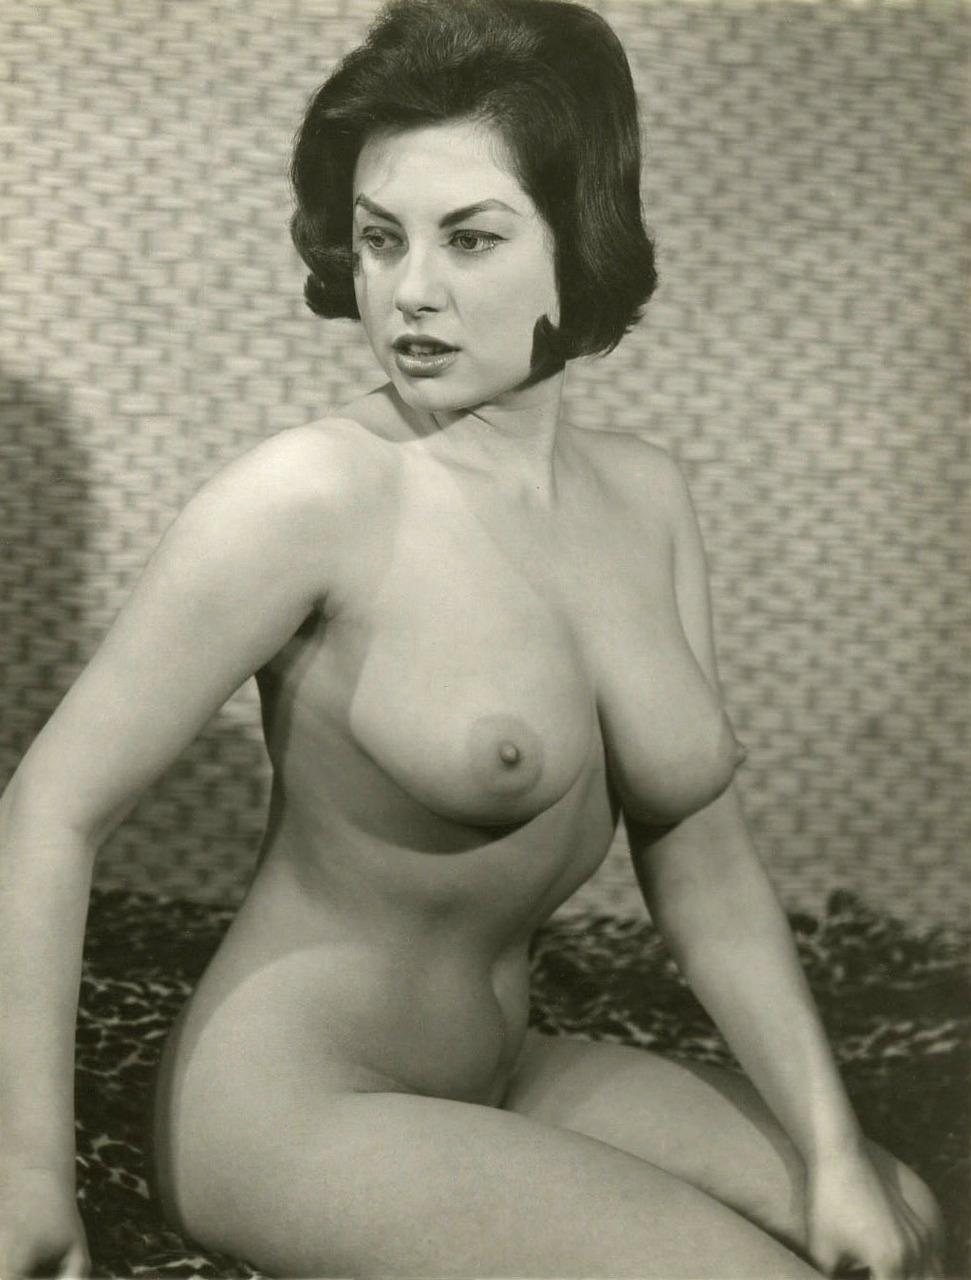 Nude fargo woman #12